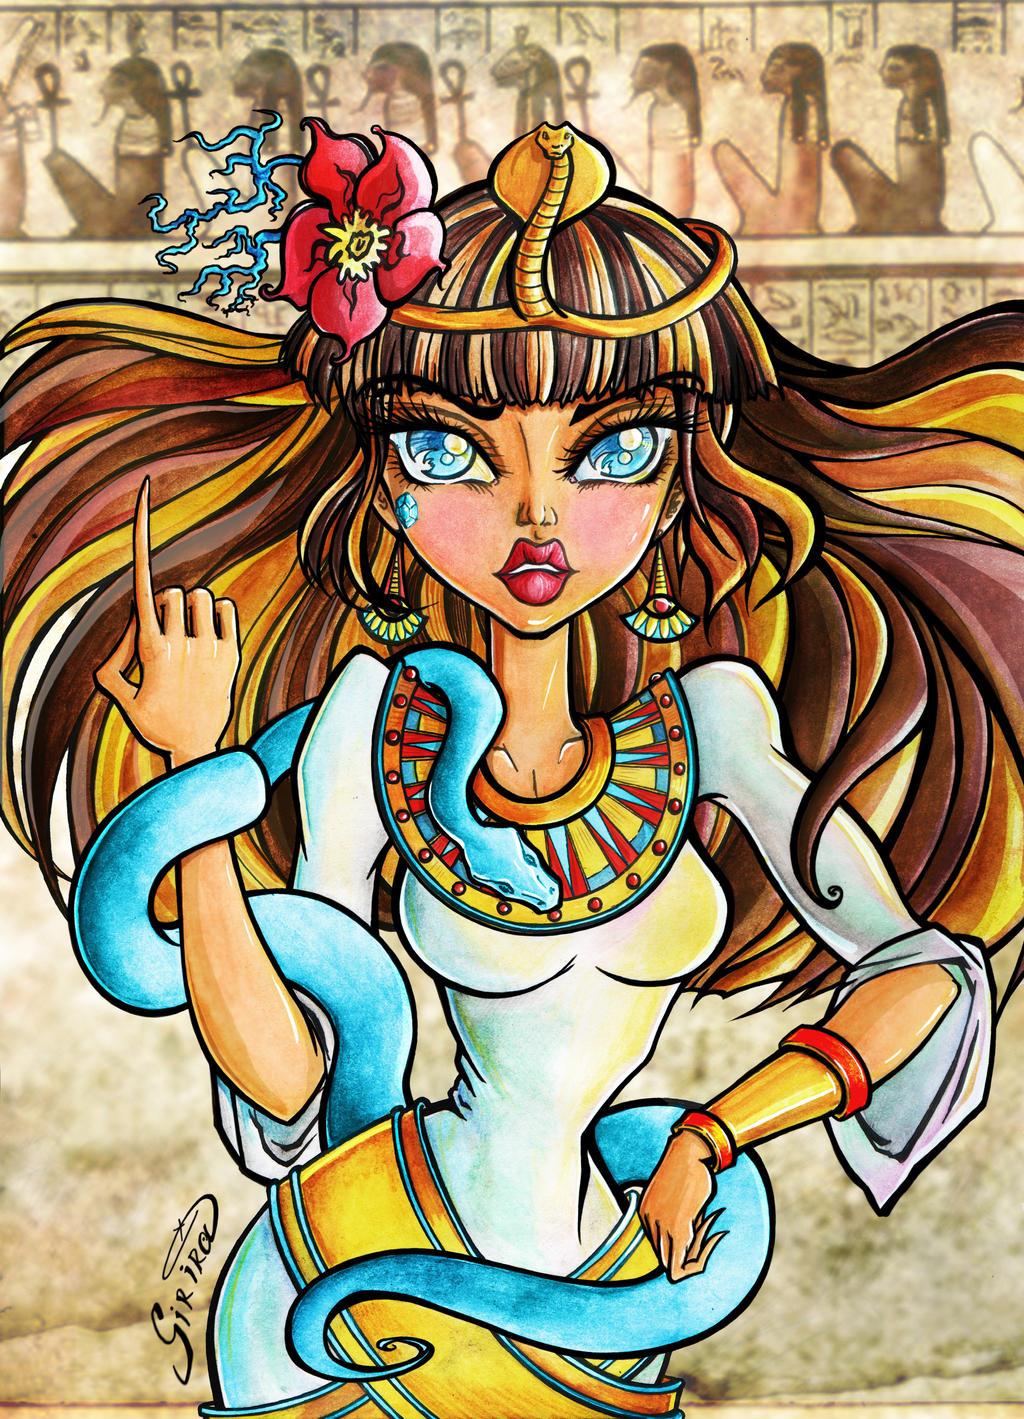 Cleo De Nile By SiriraLiluria On DeviantArt